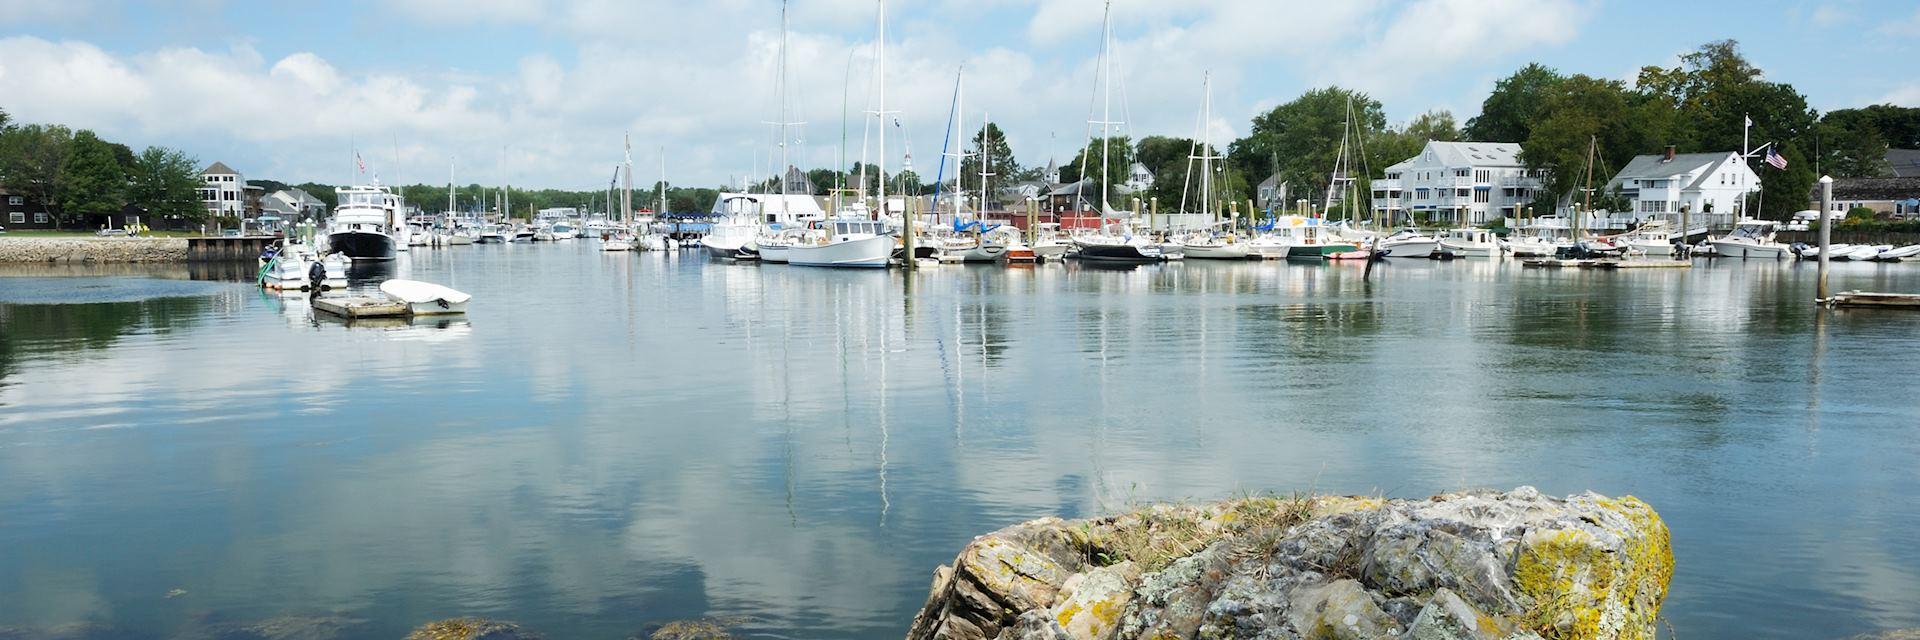 Kennebunkport marina